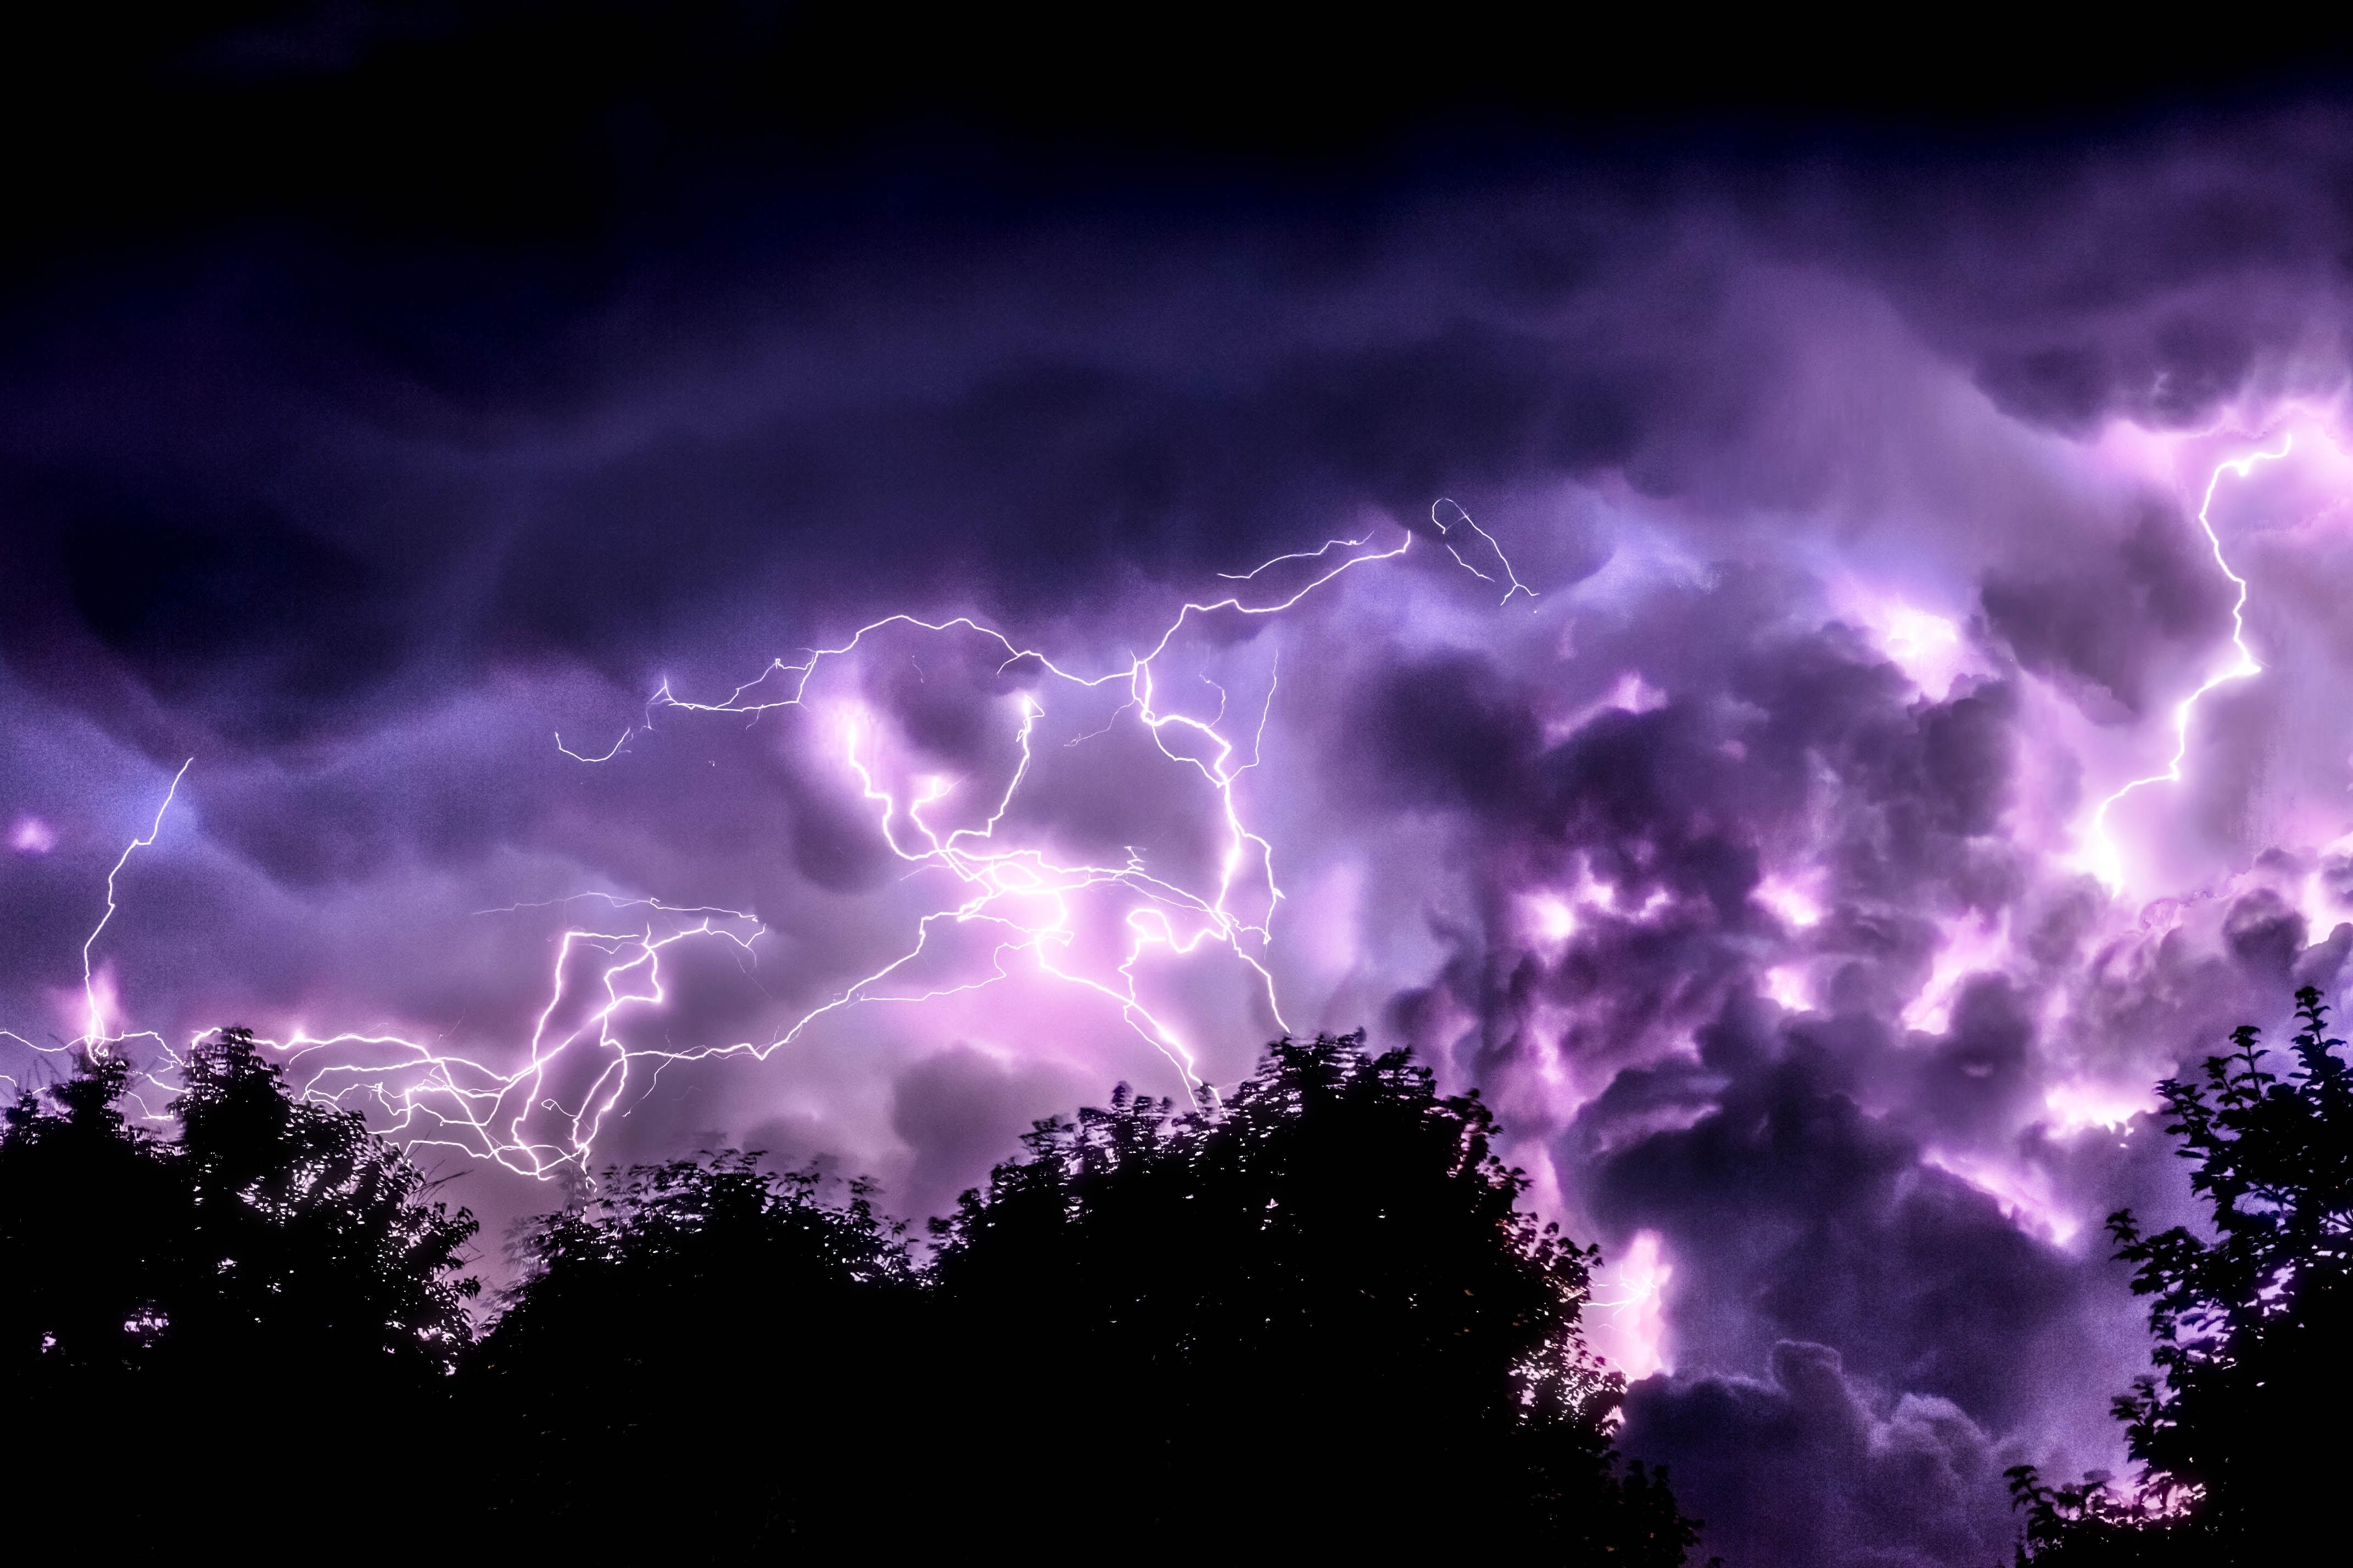 lightning and trees photo by jeremy thomas   jeremythomasphoto  on unsplash